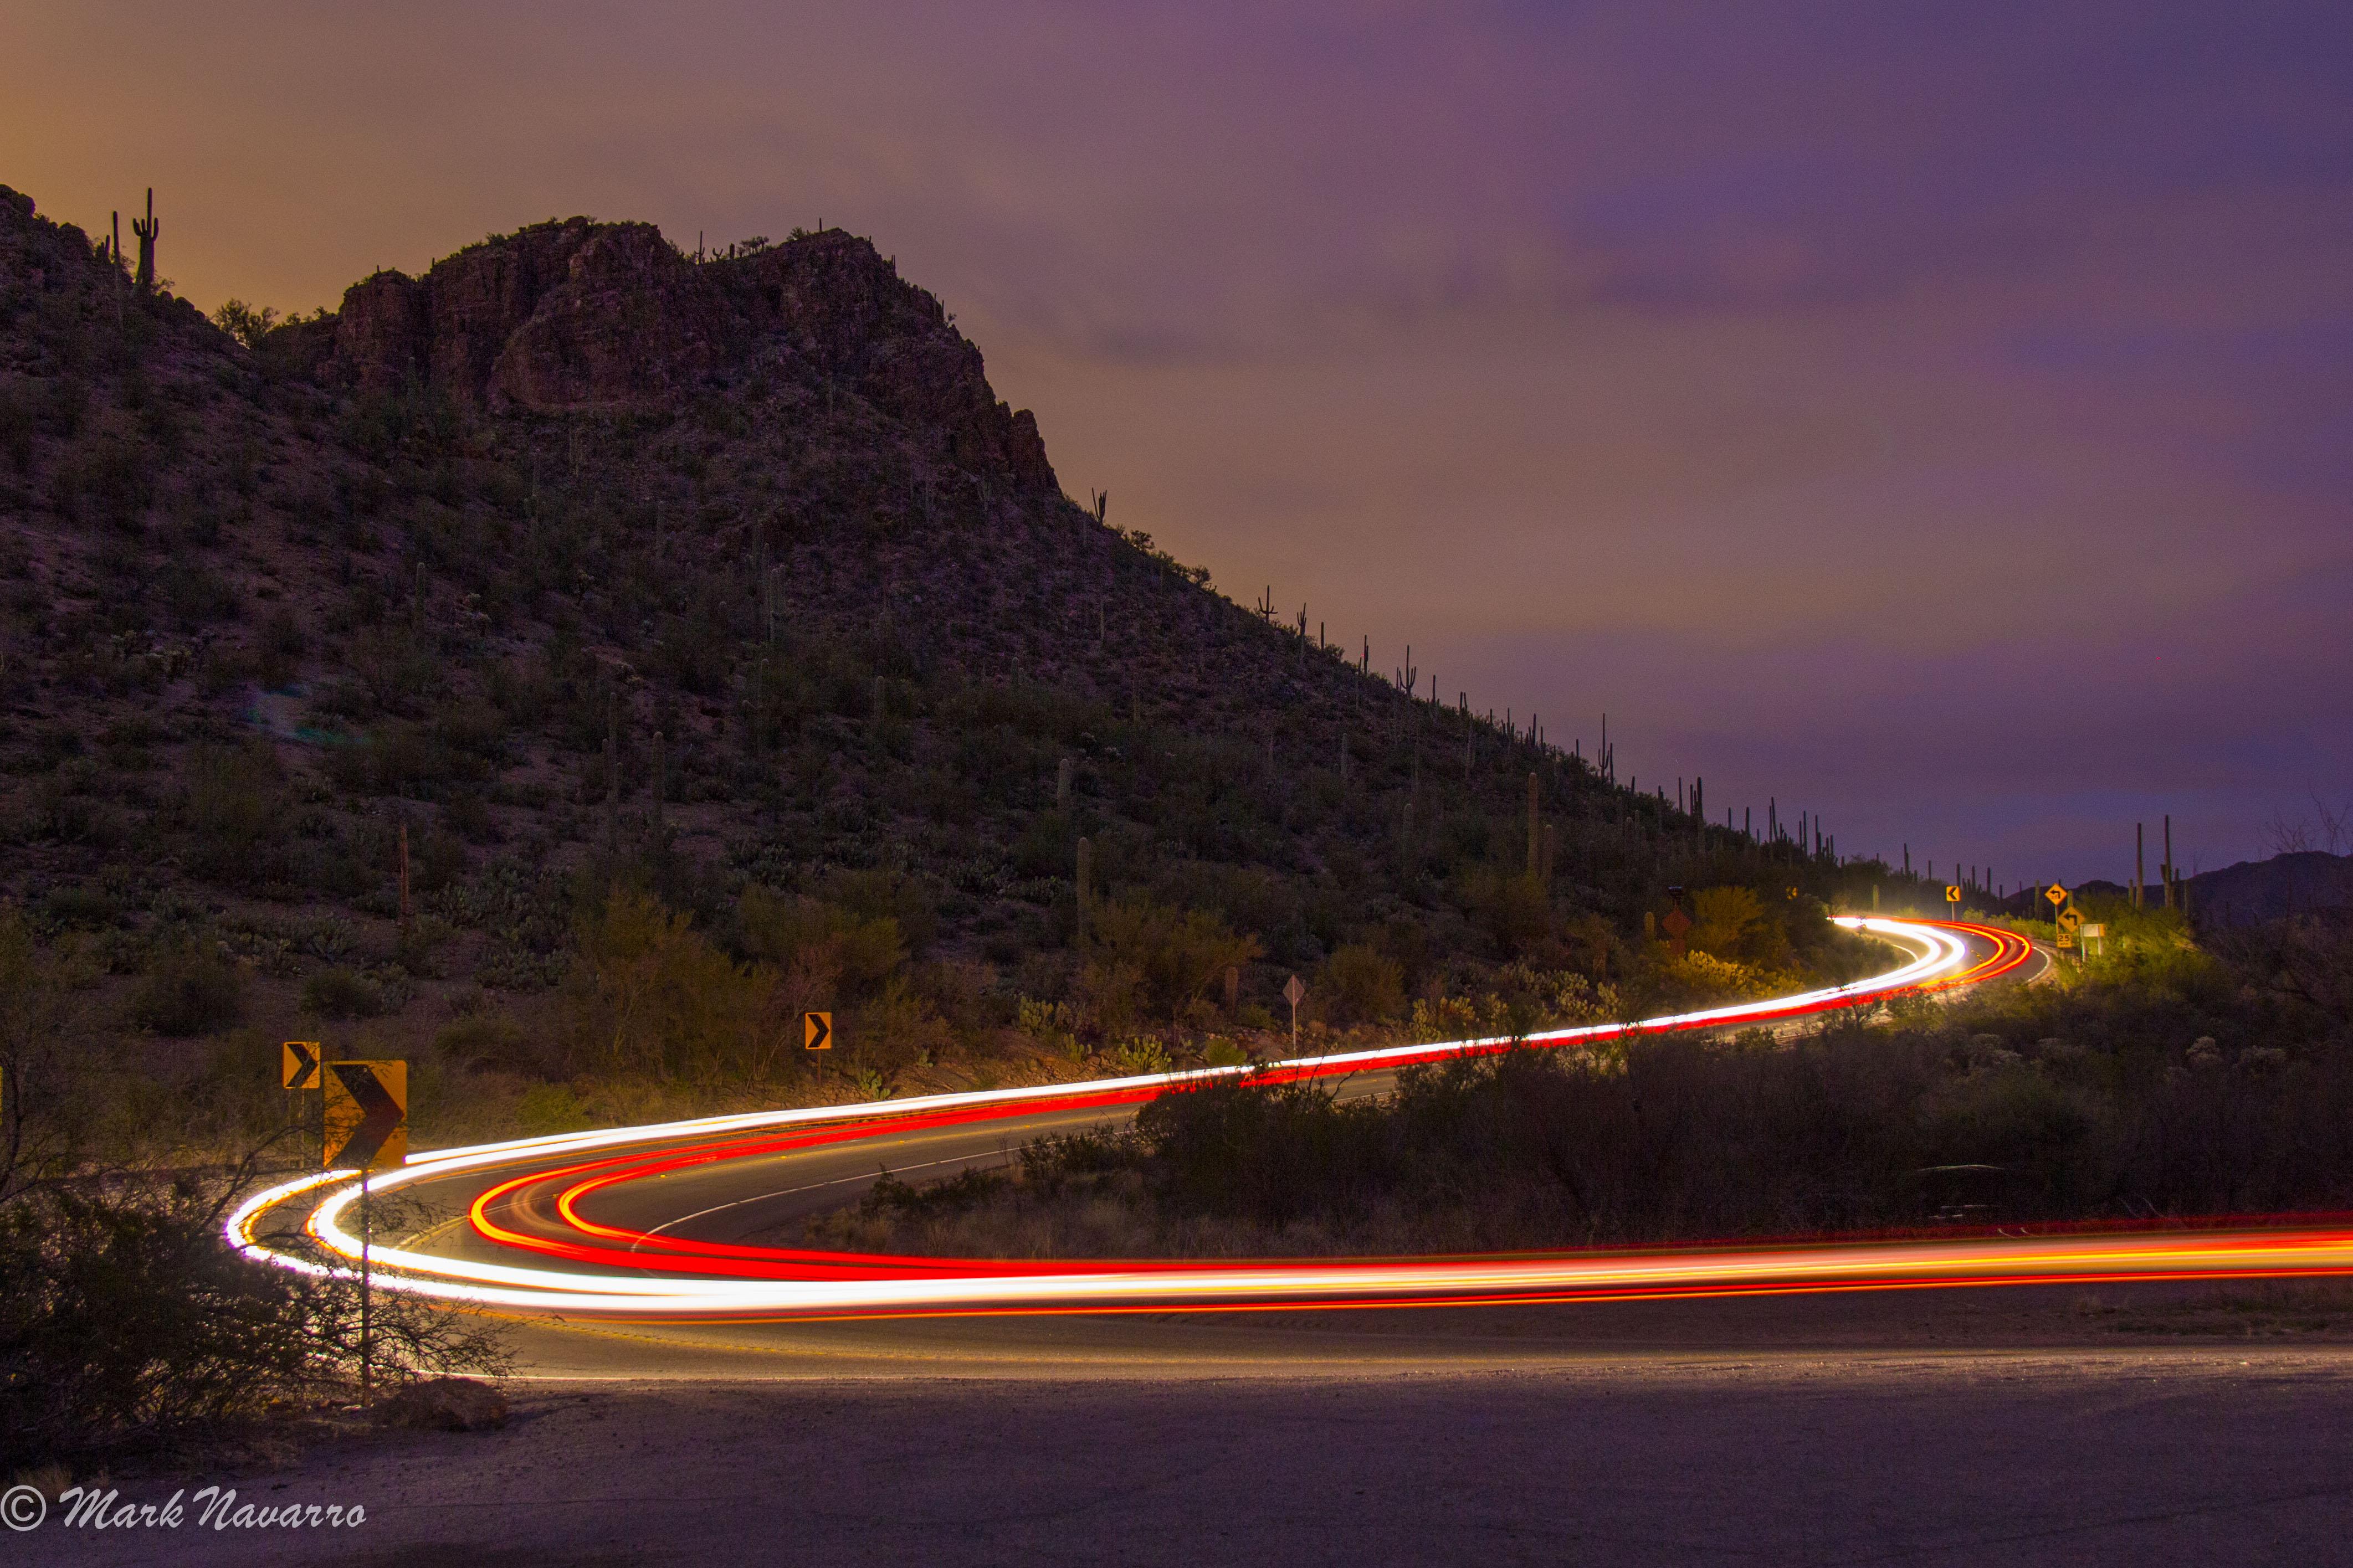 Lights Mountains Sunset Night Reflection Road Sunrise Evening Morning Desert Traffic Highway Dusk Arizona Infrastructure Light